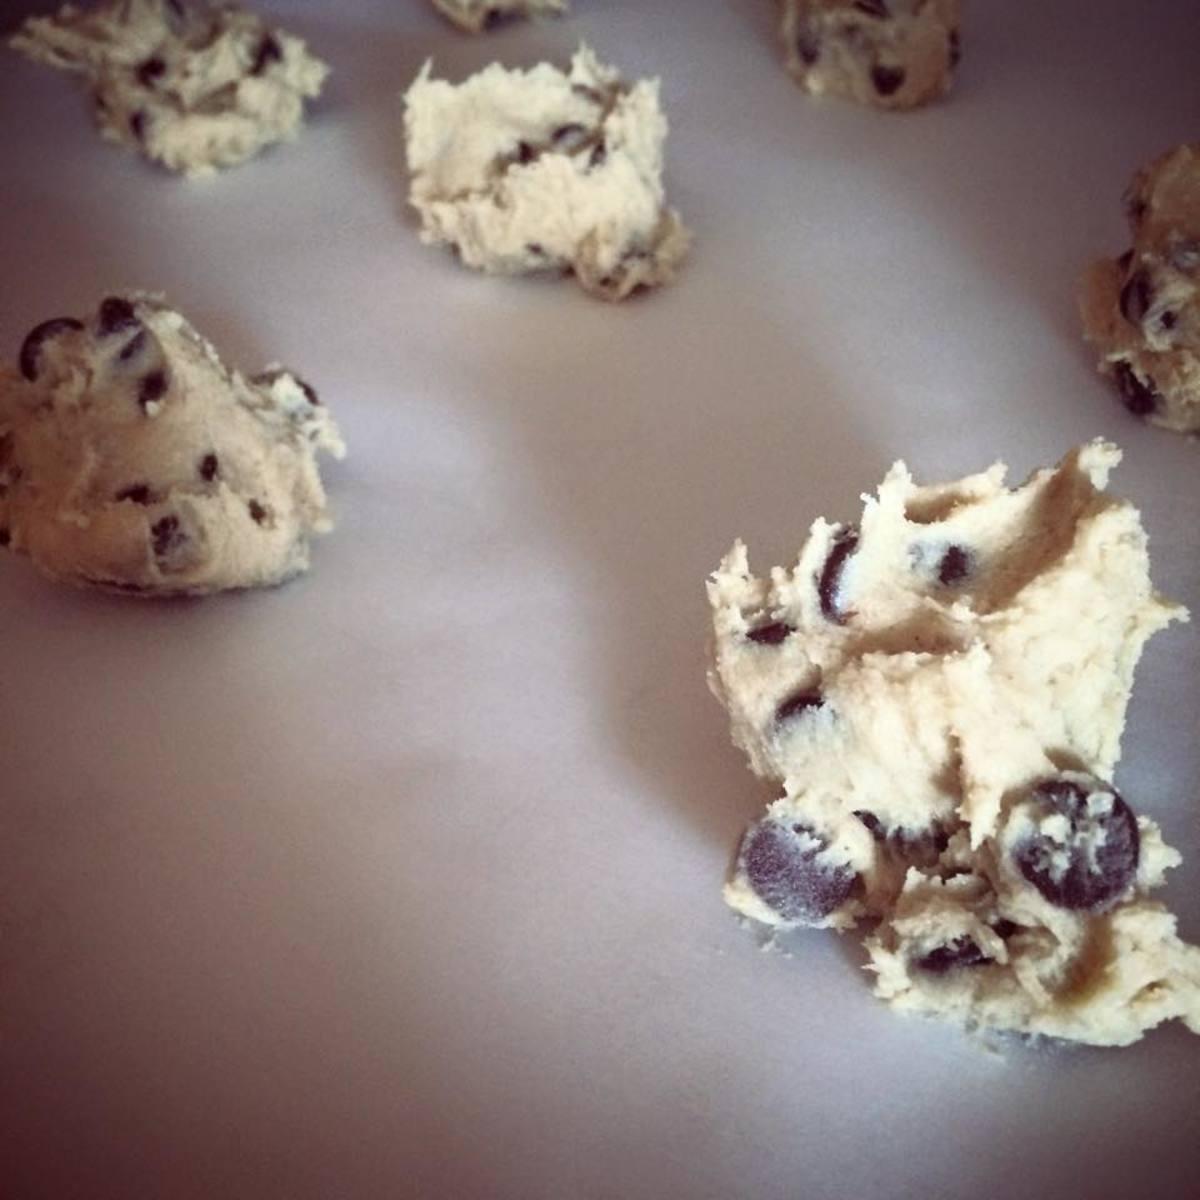 Cholee Clay Chocolate Chip Cookies